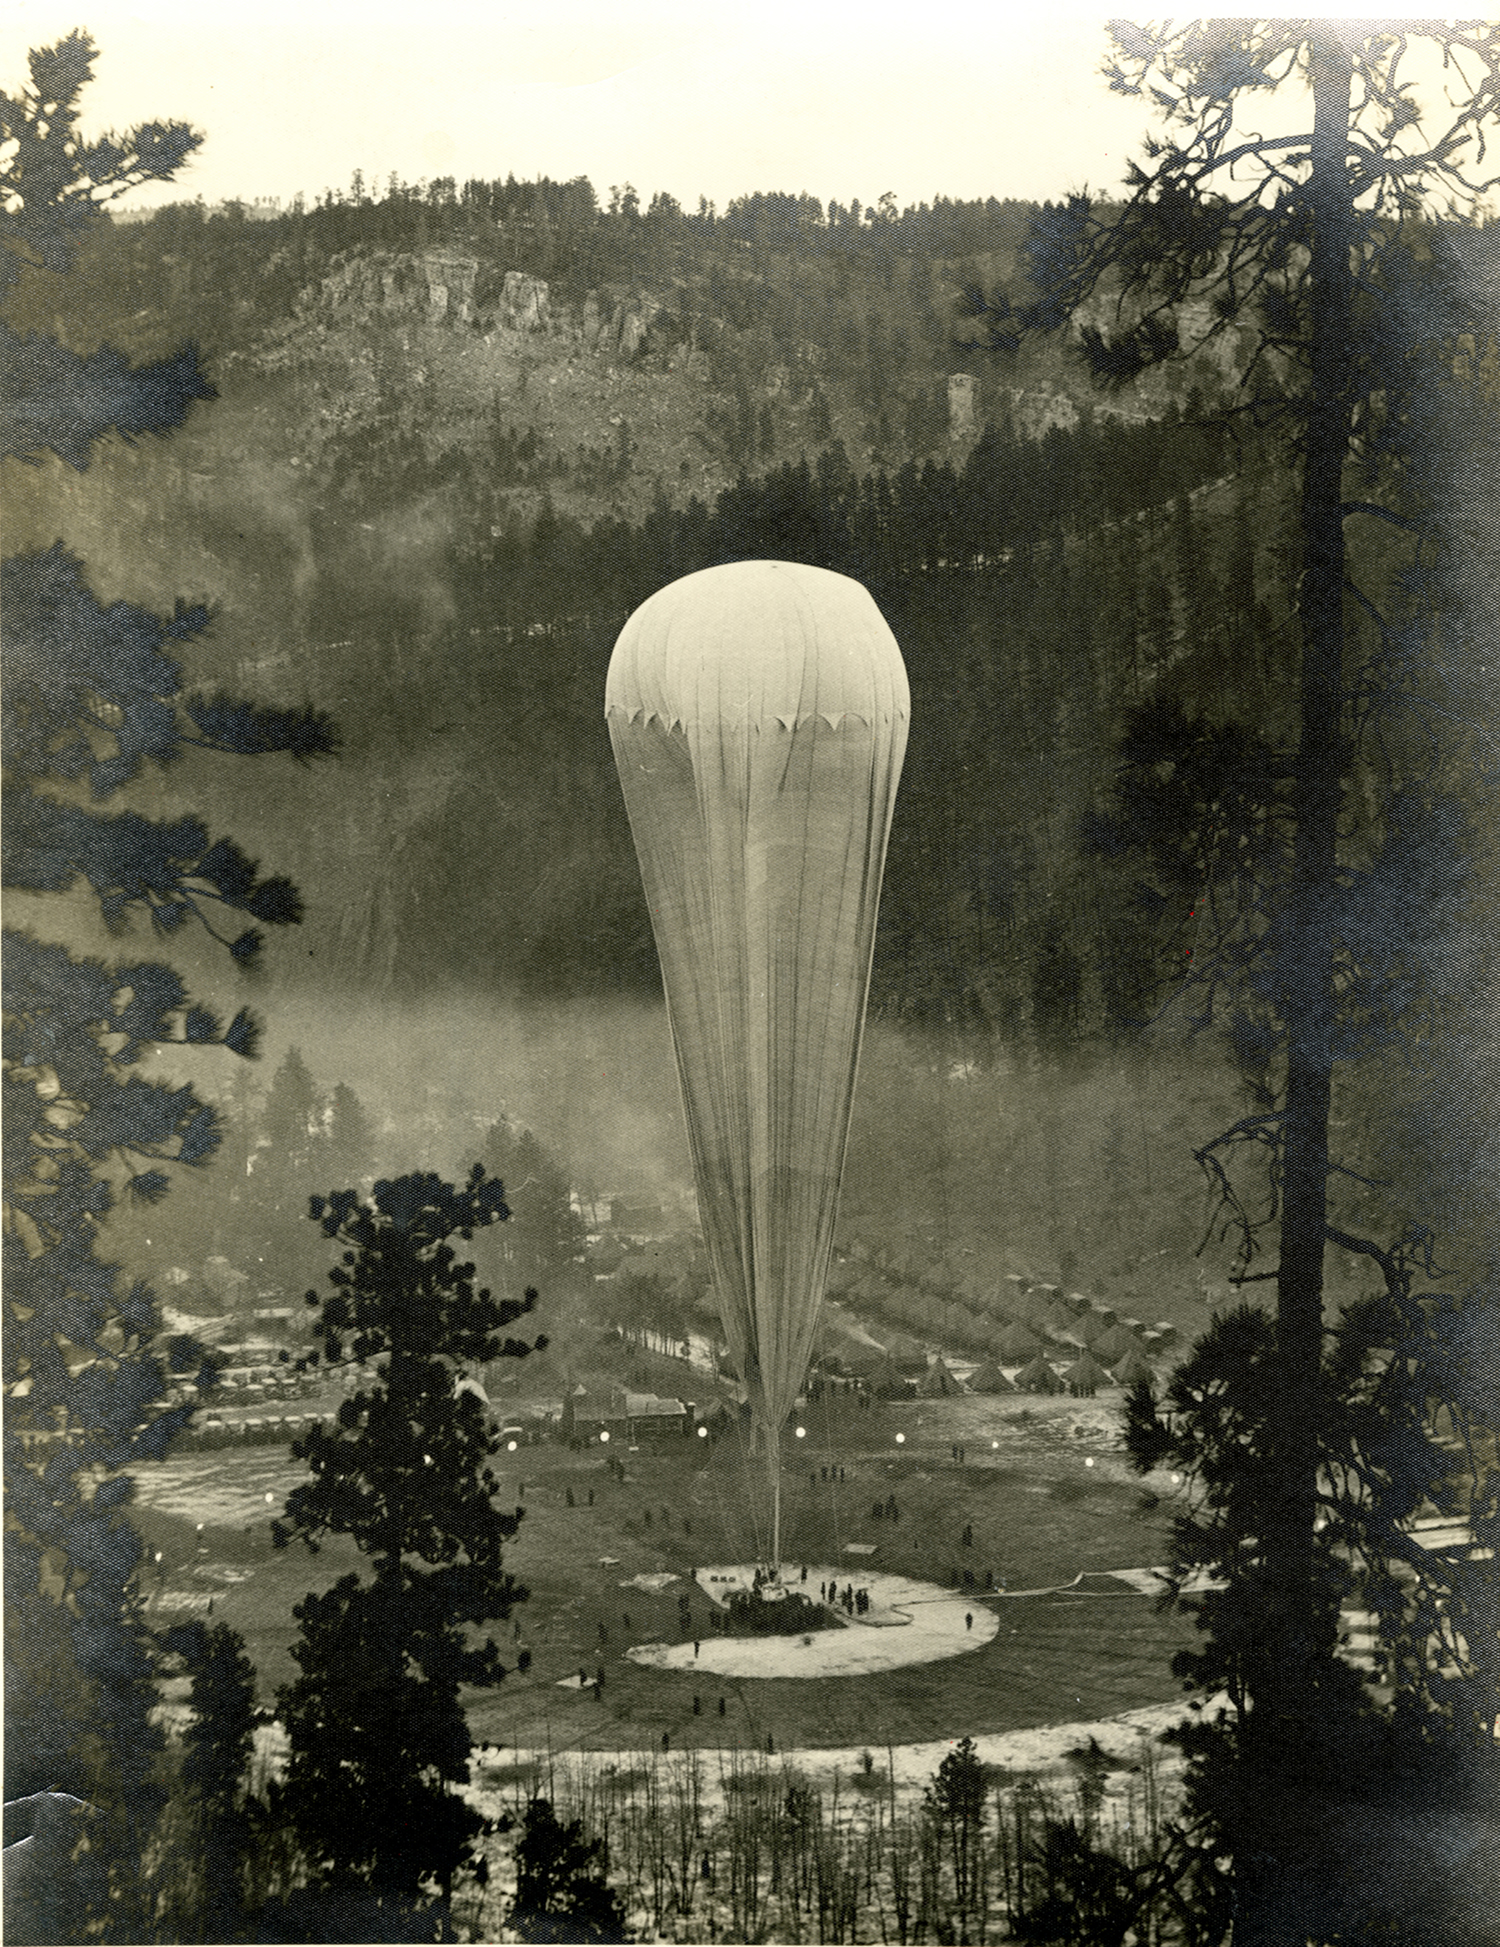 Image - ExplorerIIBaloonFlight_StratosphereBowl_1935.jpg